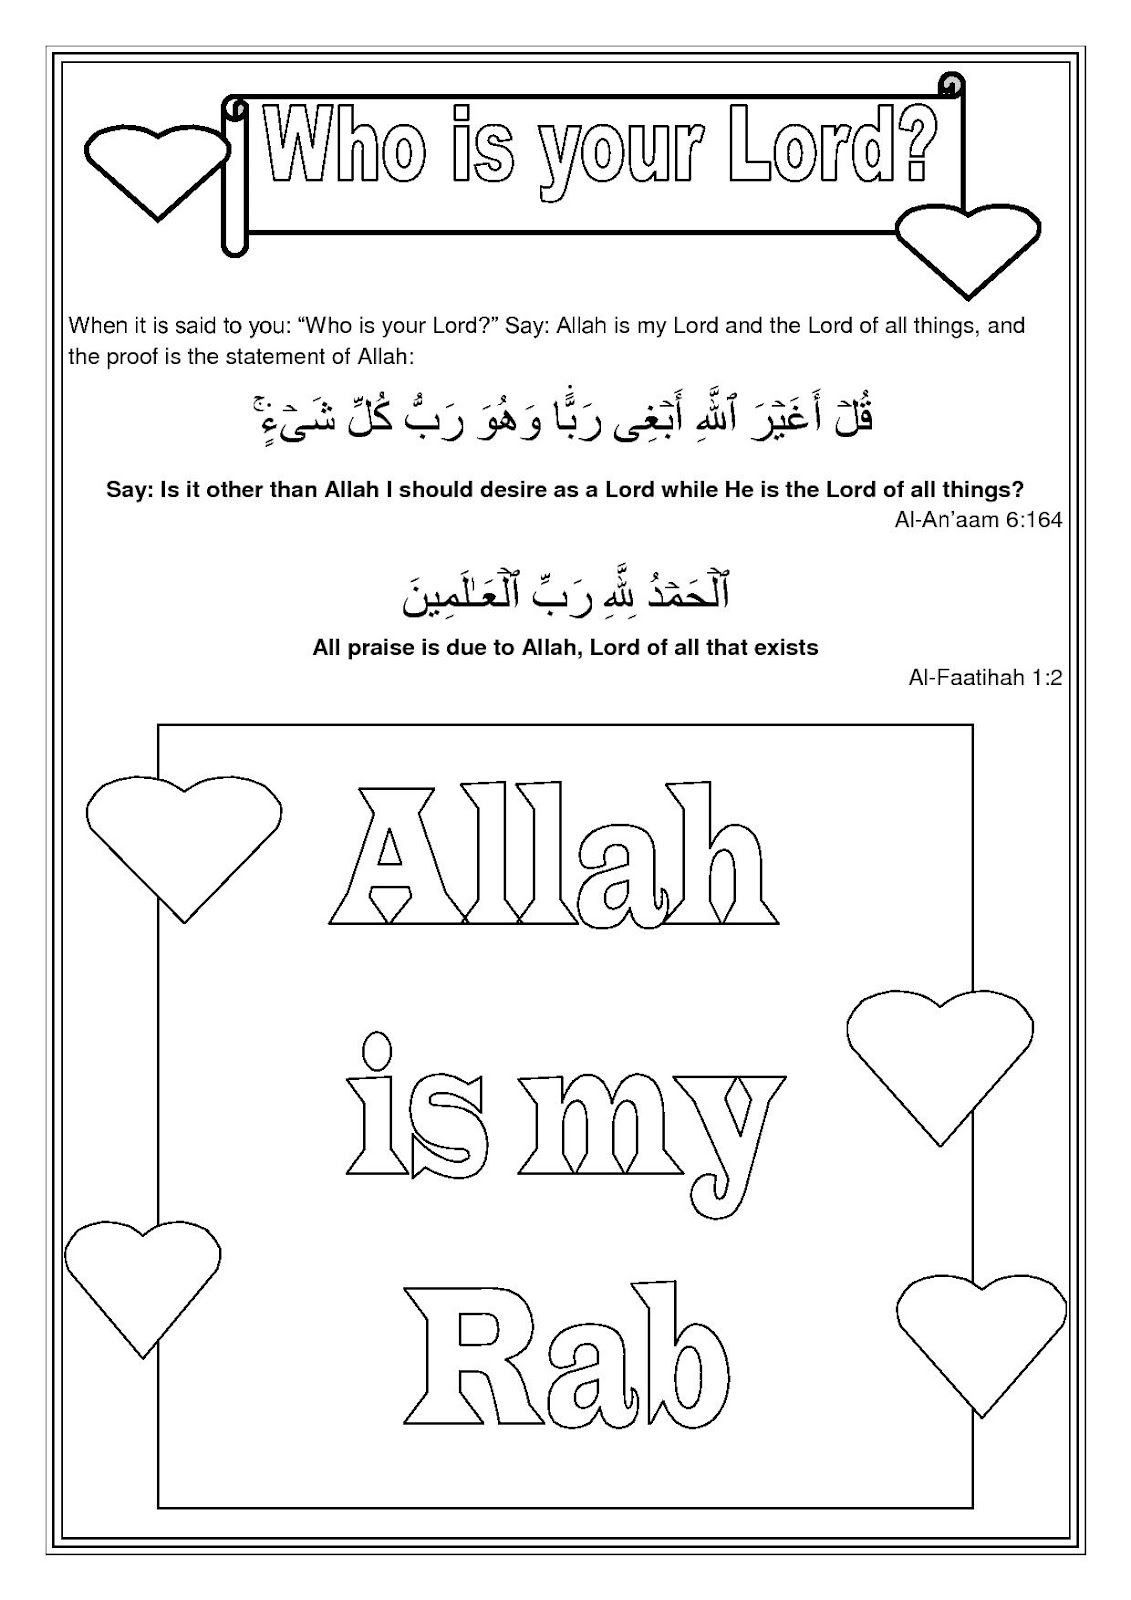 Islamic Studies Worksheets For Kindergarten Worksheet For Kindergarten Kindergarten Worksheets Kindergarten Worksheets Printable Free Kindergarten Worksheets [ 1600 x 1131 Pixel ]